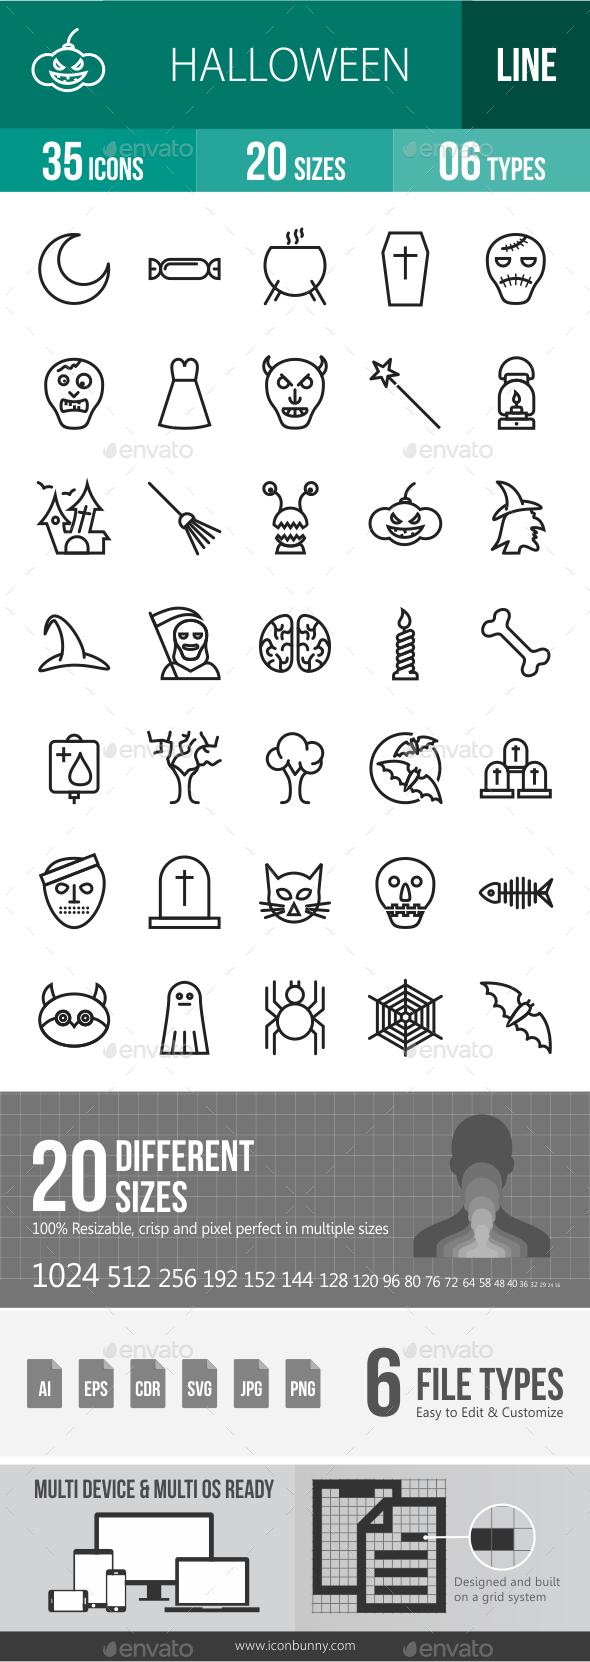 Halloween Line Icons - Icons